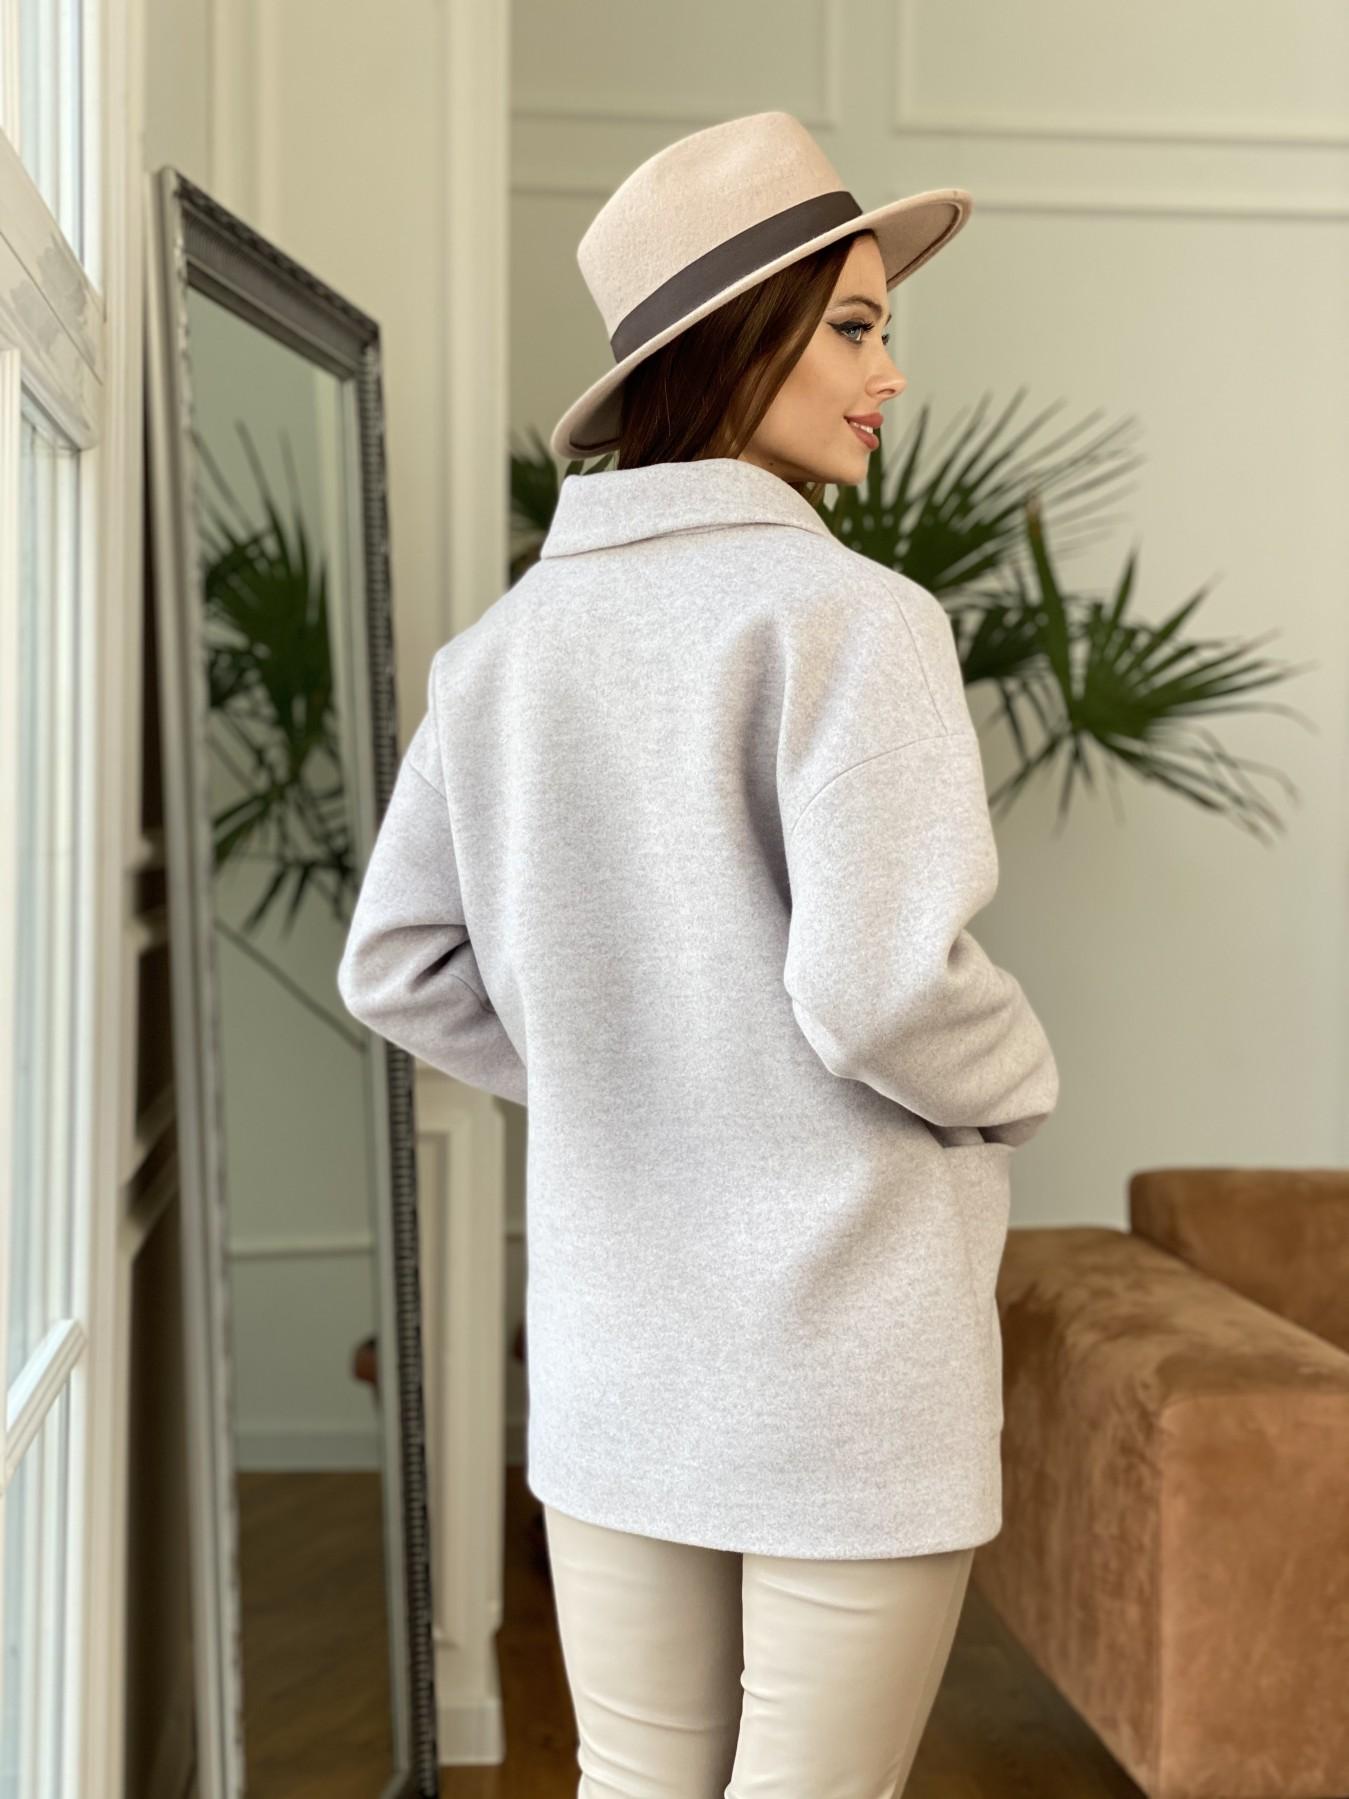 Мансера пальто кашемир меланж на трикотаже  10629 АРТ. 47553 Цвет: Бежевый меланж - фото 6, интернет магазин tm-modus.ru